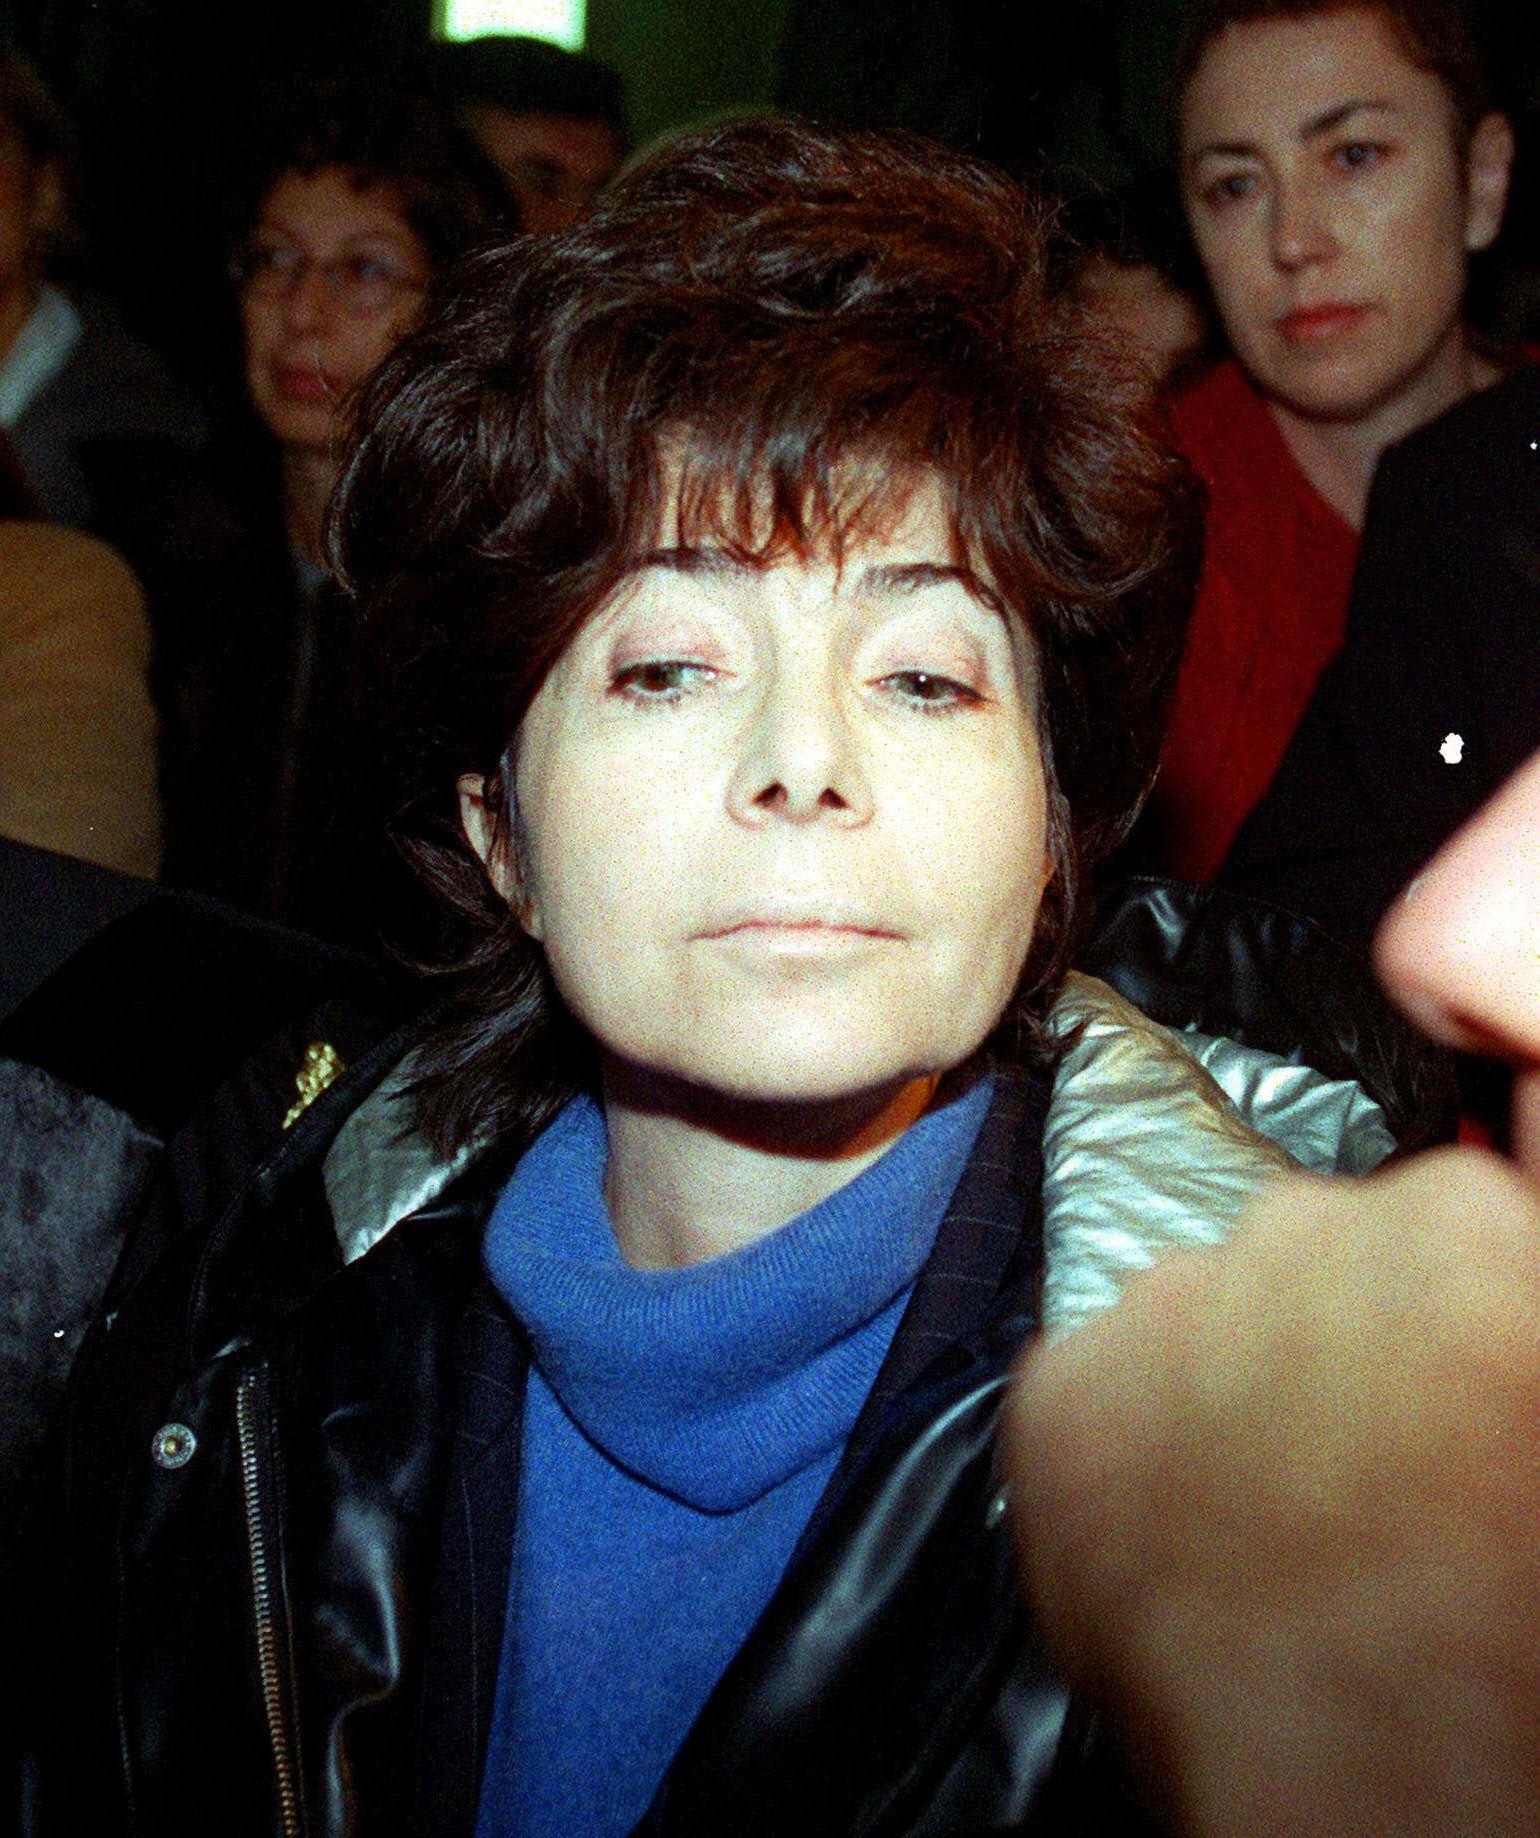 H Patrizia Peggiani, η γνωστή και ως «μαύρη χήρα» καταδικάστηκε ως ηθική αυτουργός για τη δολοφονία του Gucci